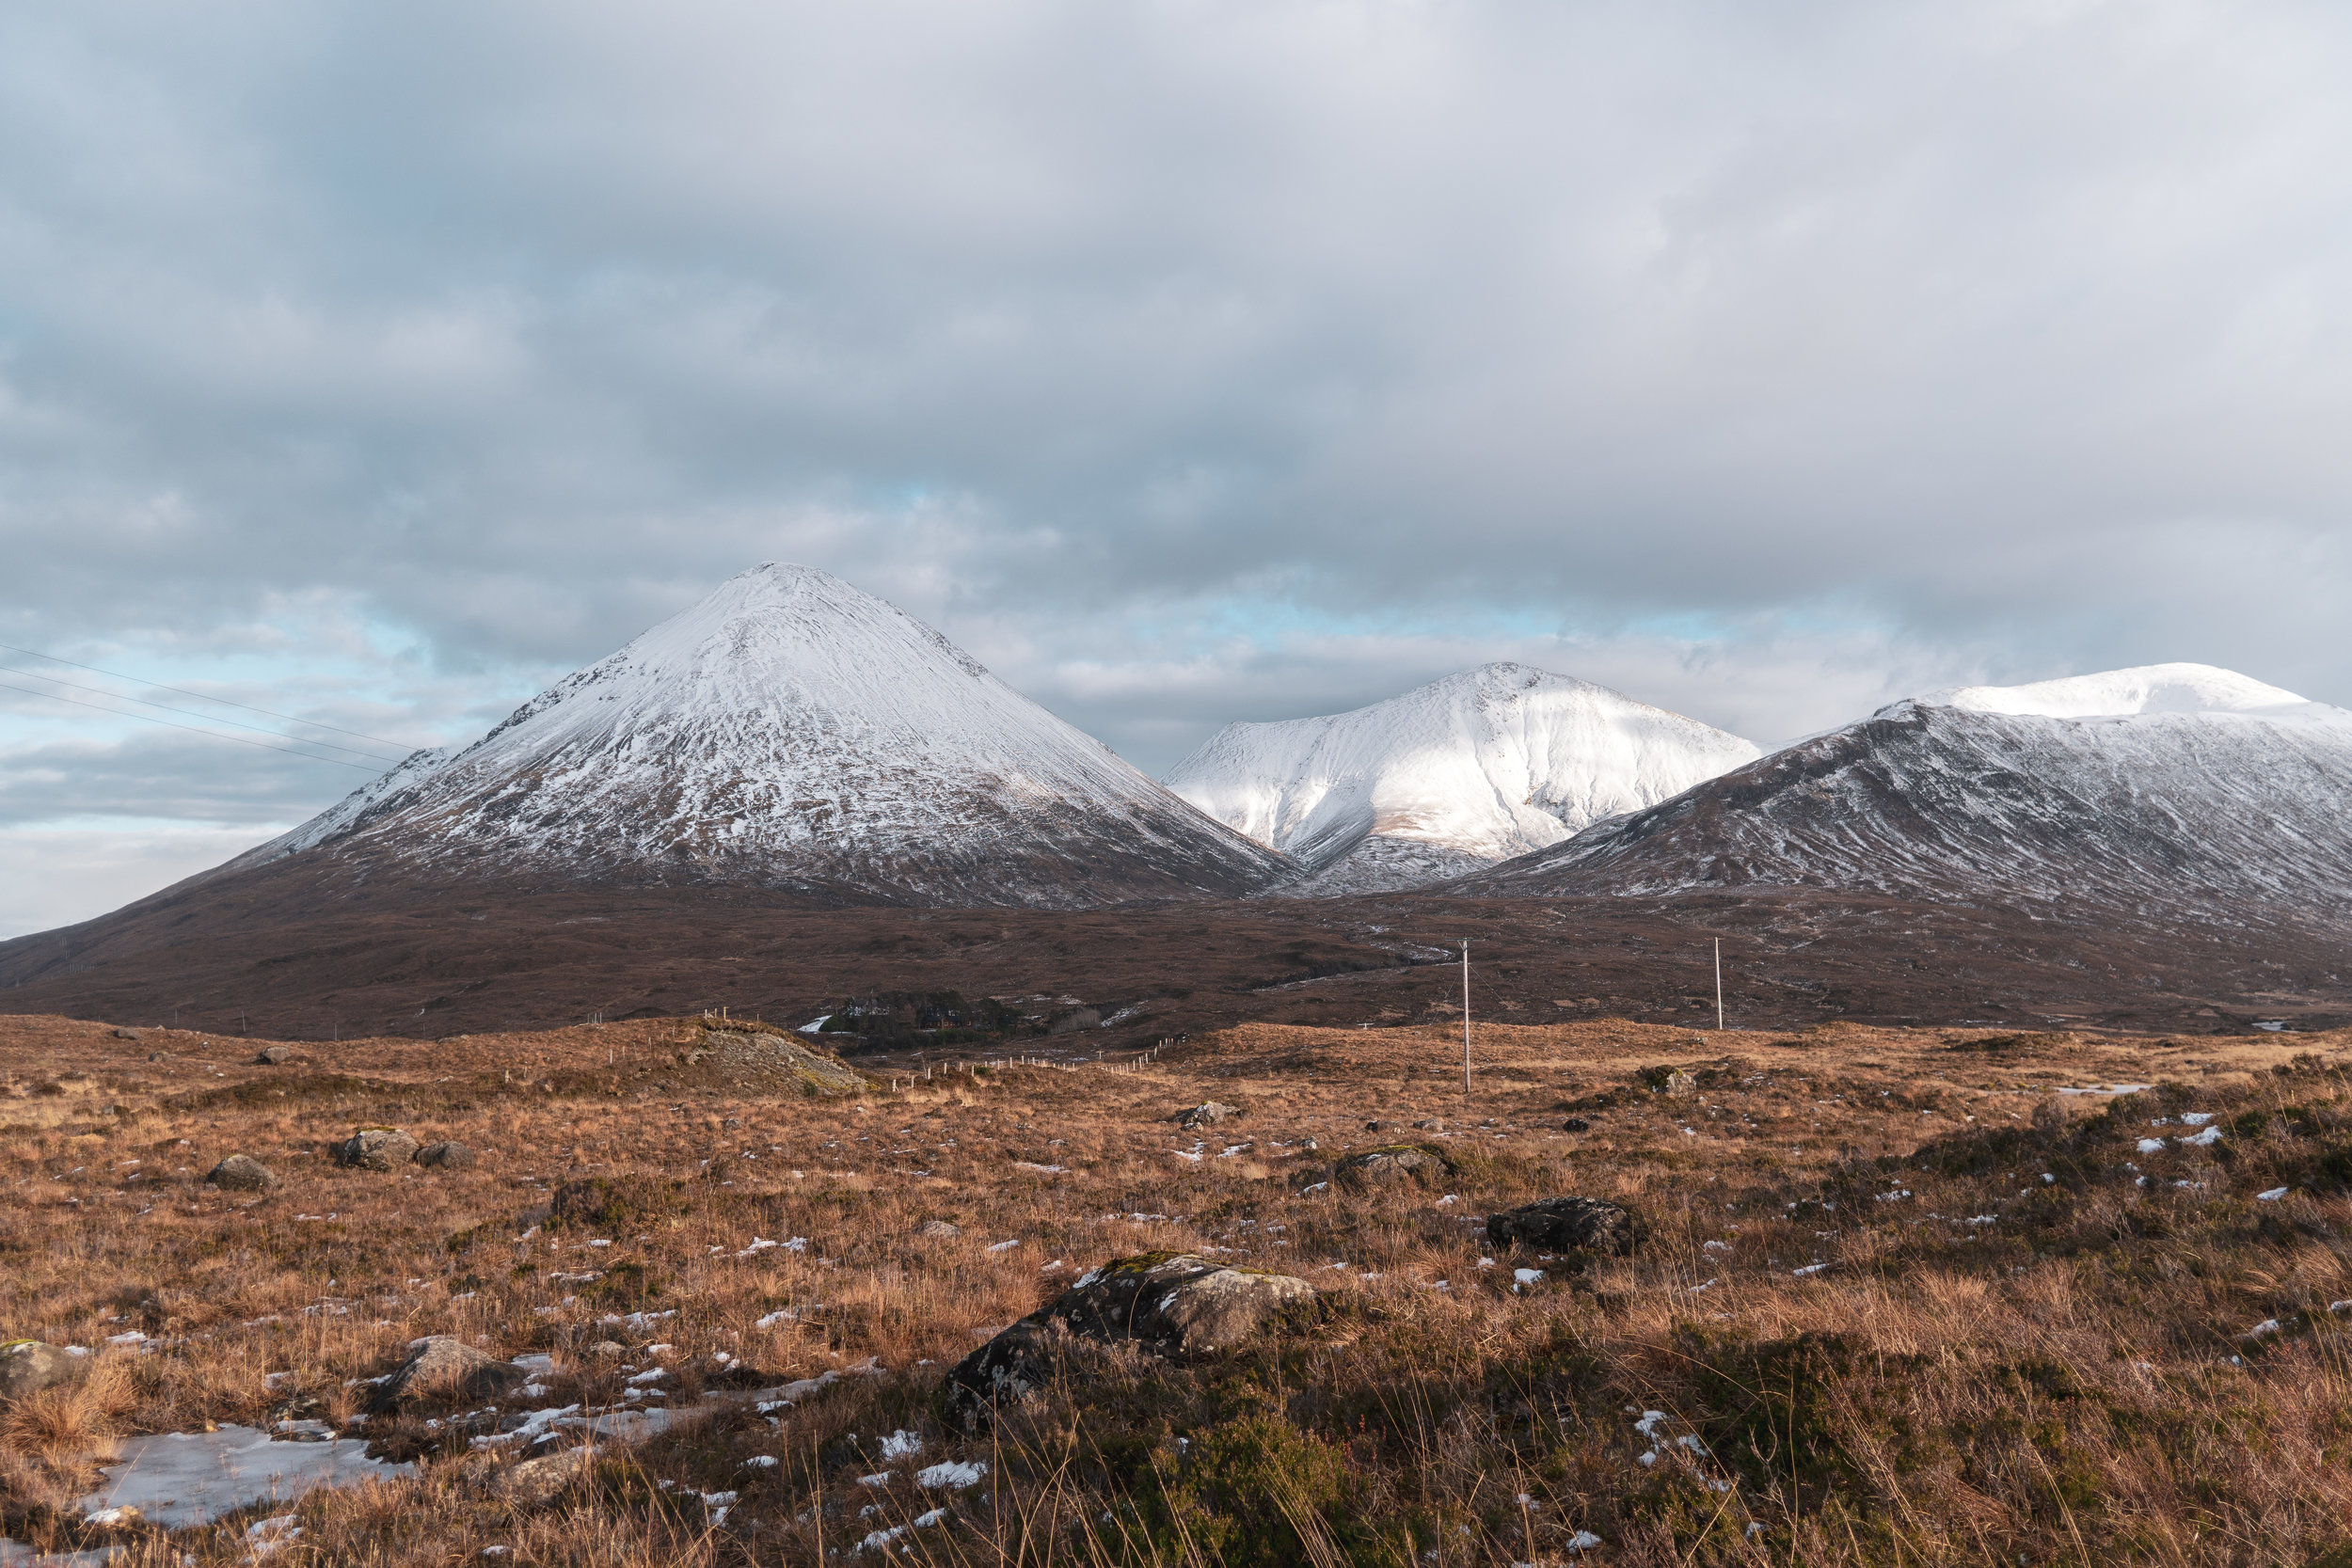 Isle-of-Skye-Fairy-Glen-und-Braes (30).jpg